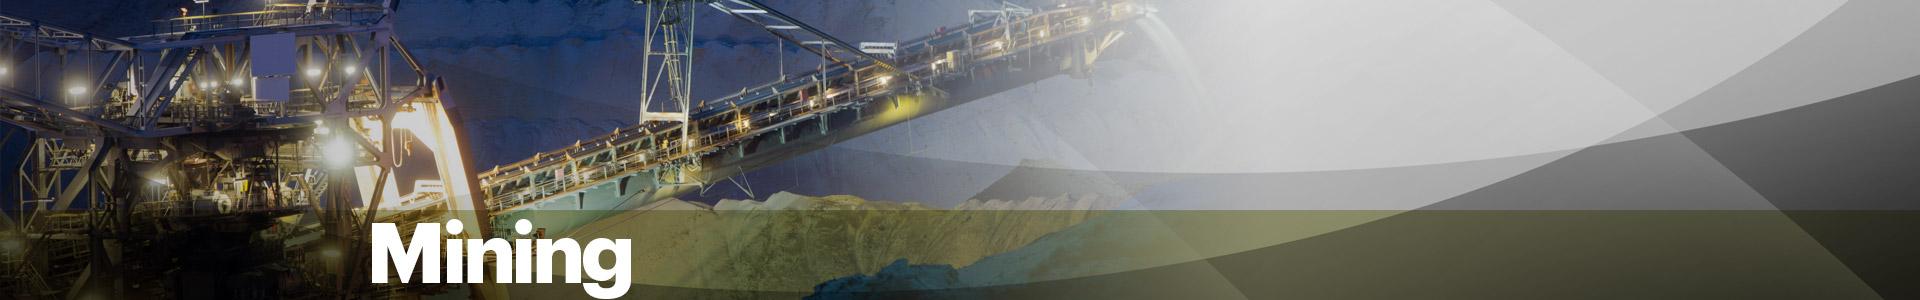 Mining Industry Banner